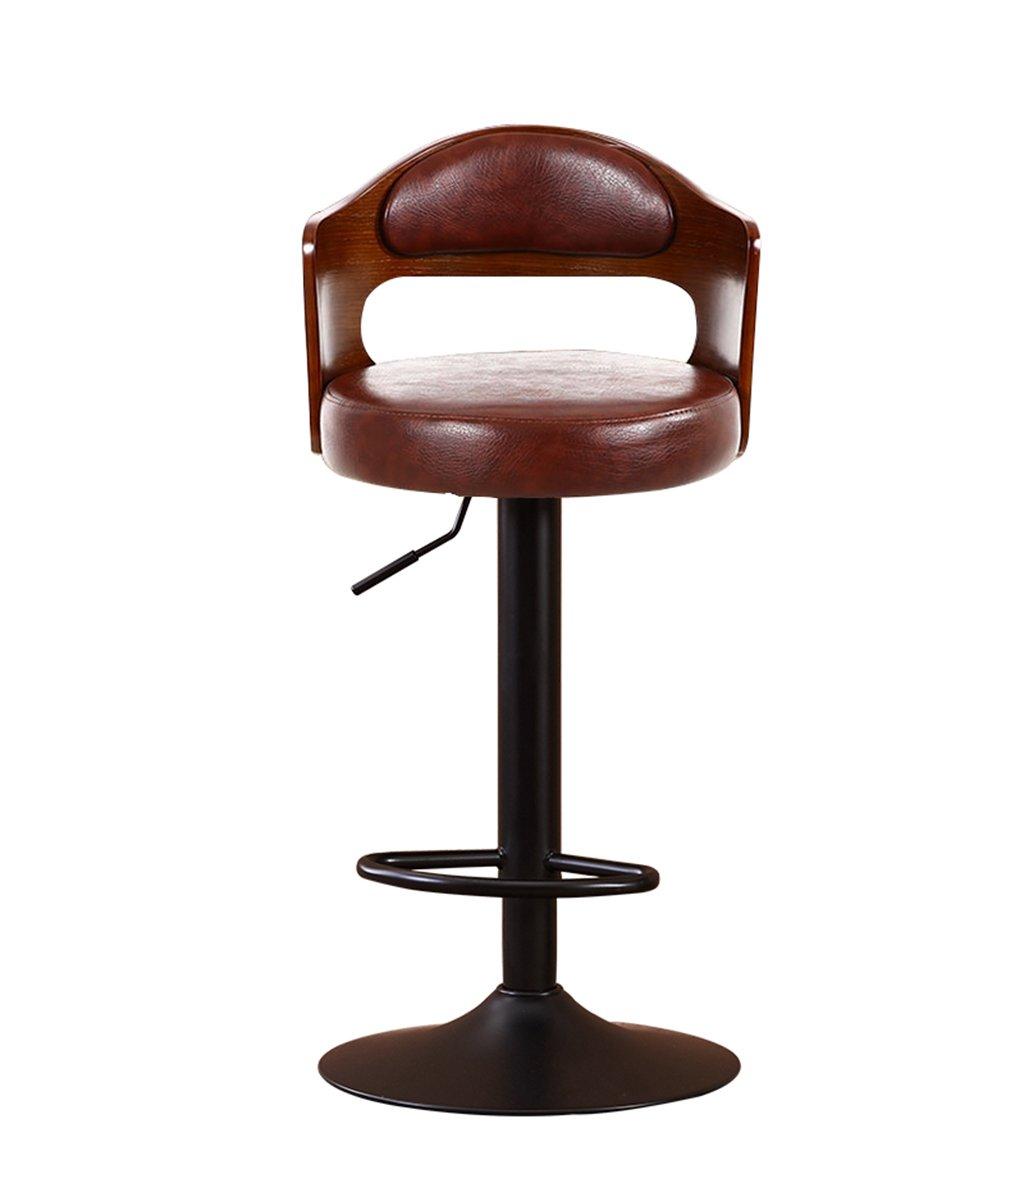 I C-J-Xin Household Bar Chair, Solid Wood Backrest Lift redate High Stool Bar Stool Cash Register Backrest Bar Chair 40  86CM Novel Style (color   E)